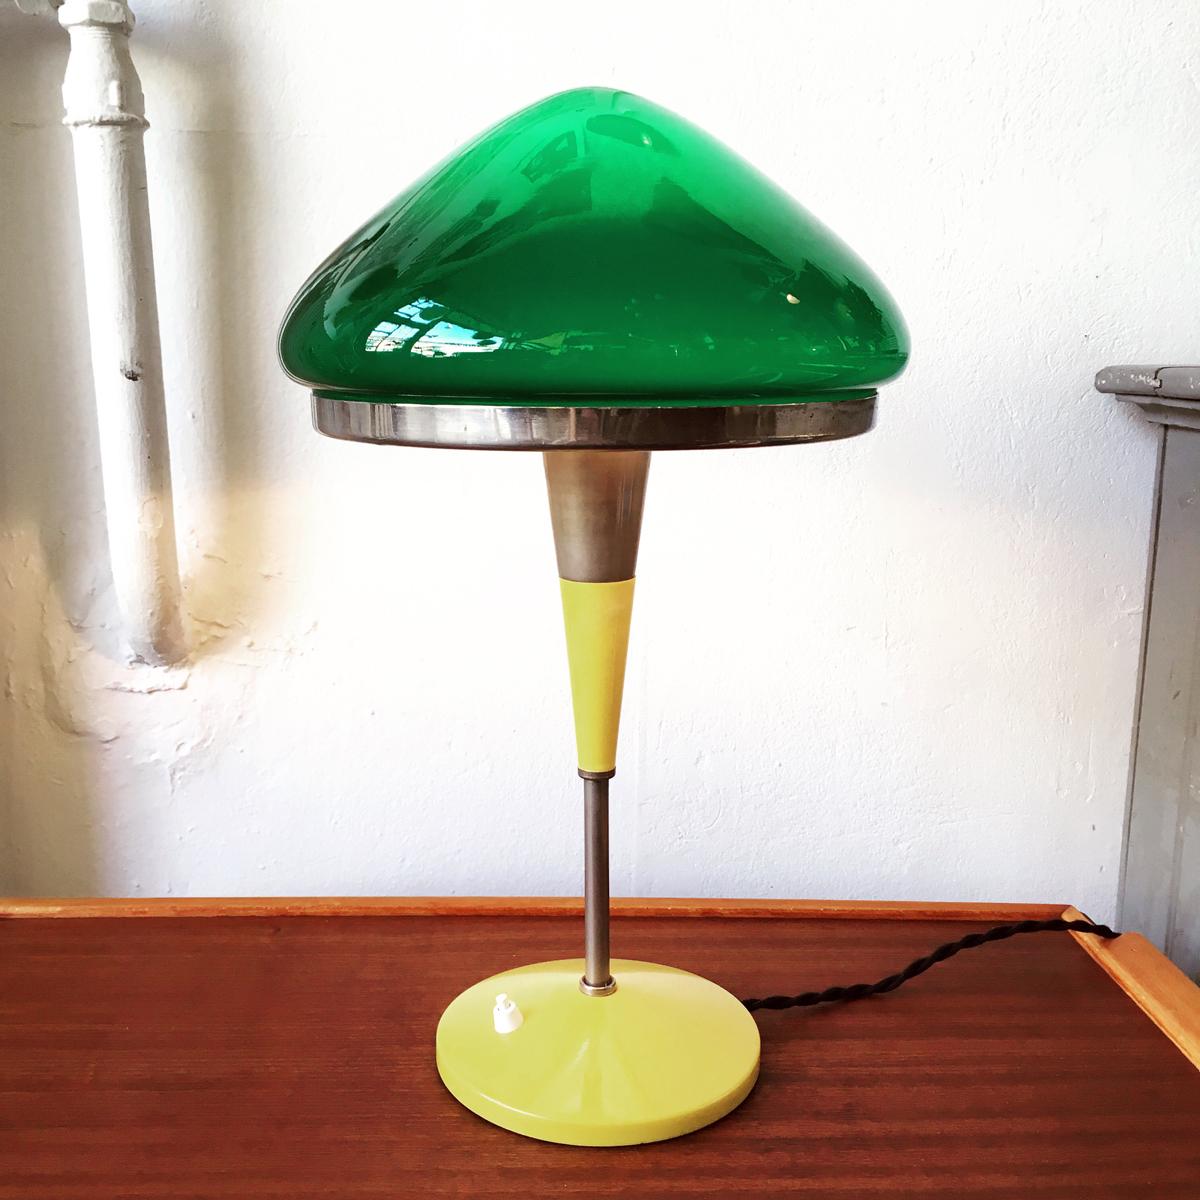 FABRIKEN_skrivbordslampa_glasskarm